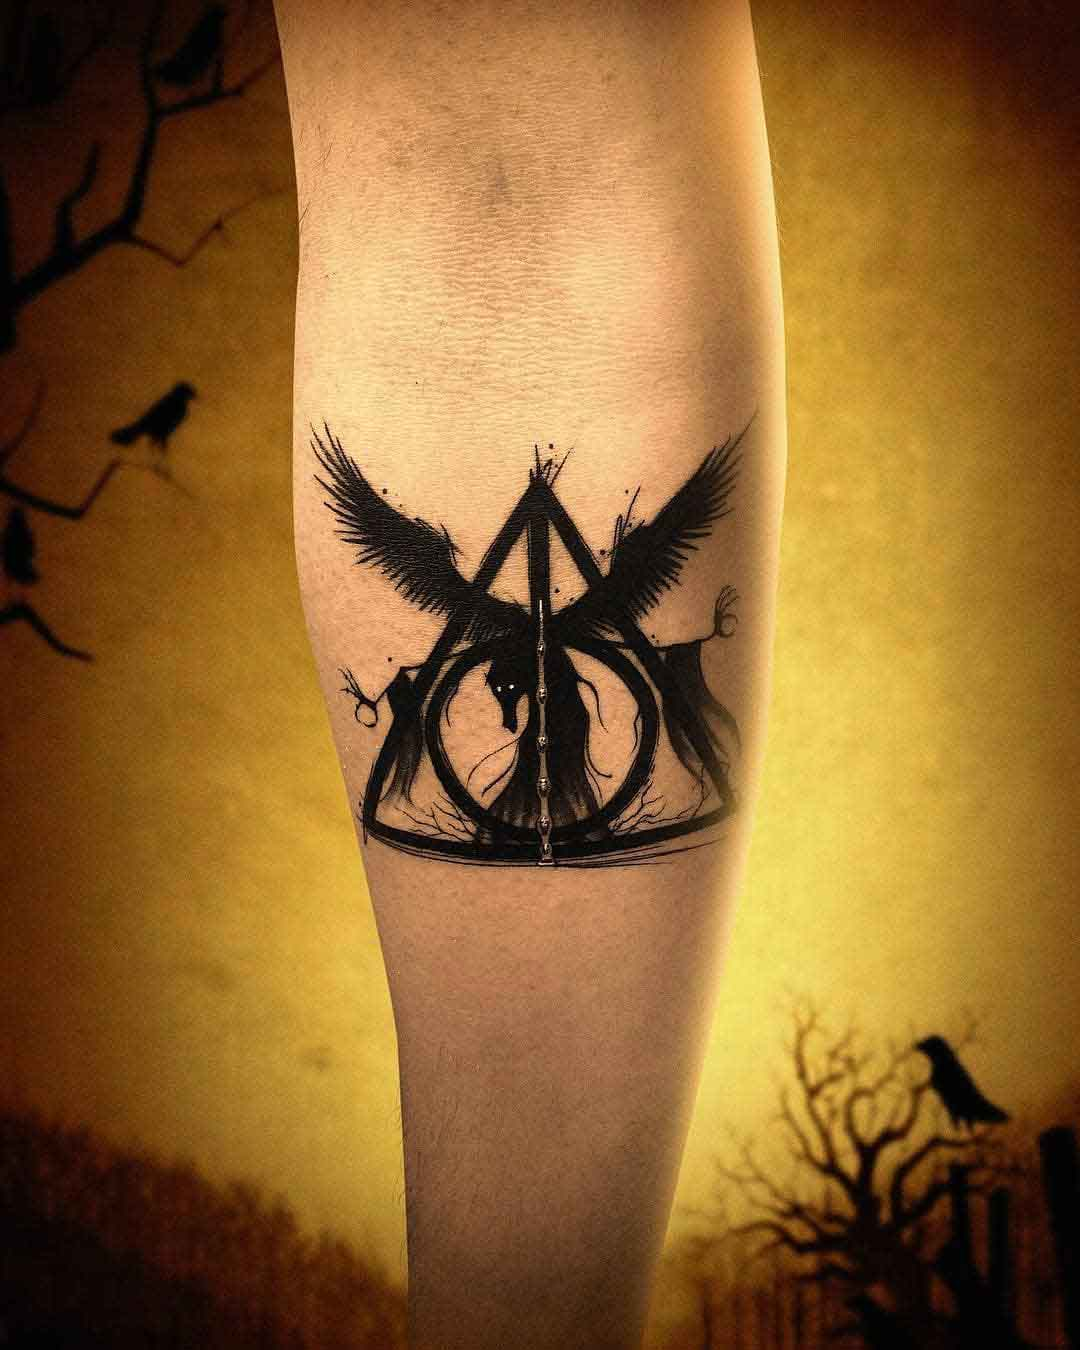 deathly hallows tattoo on arm